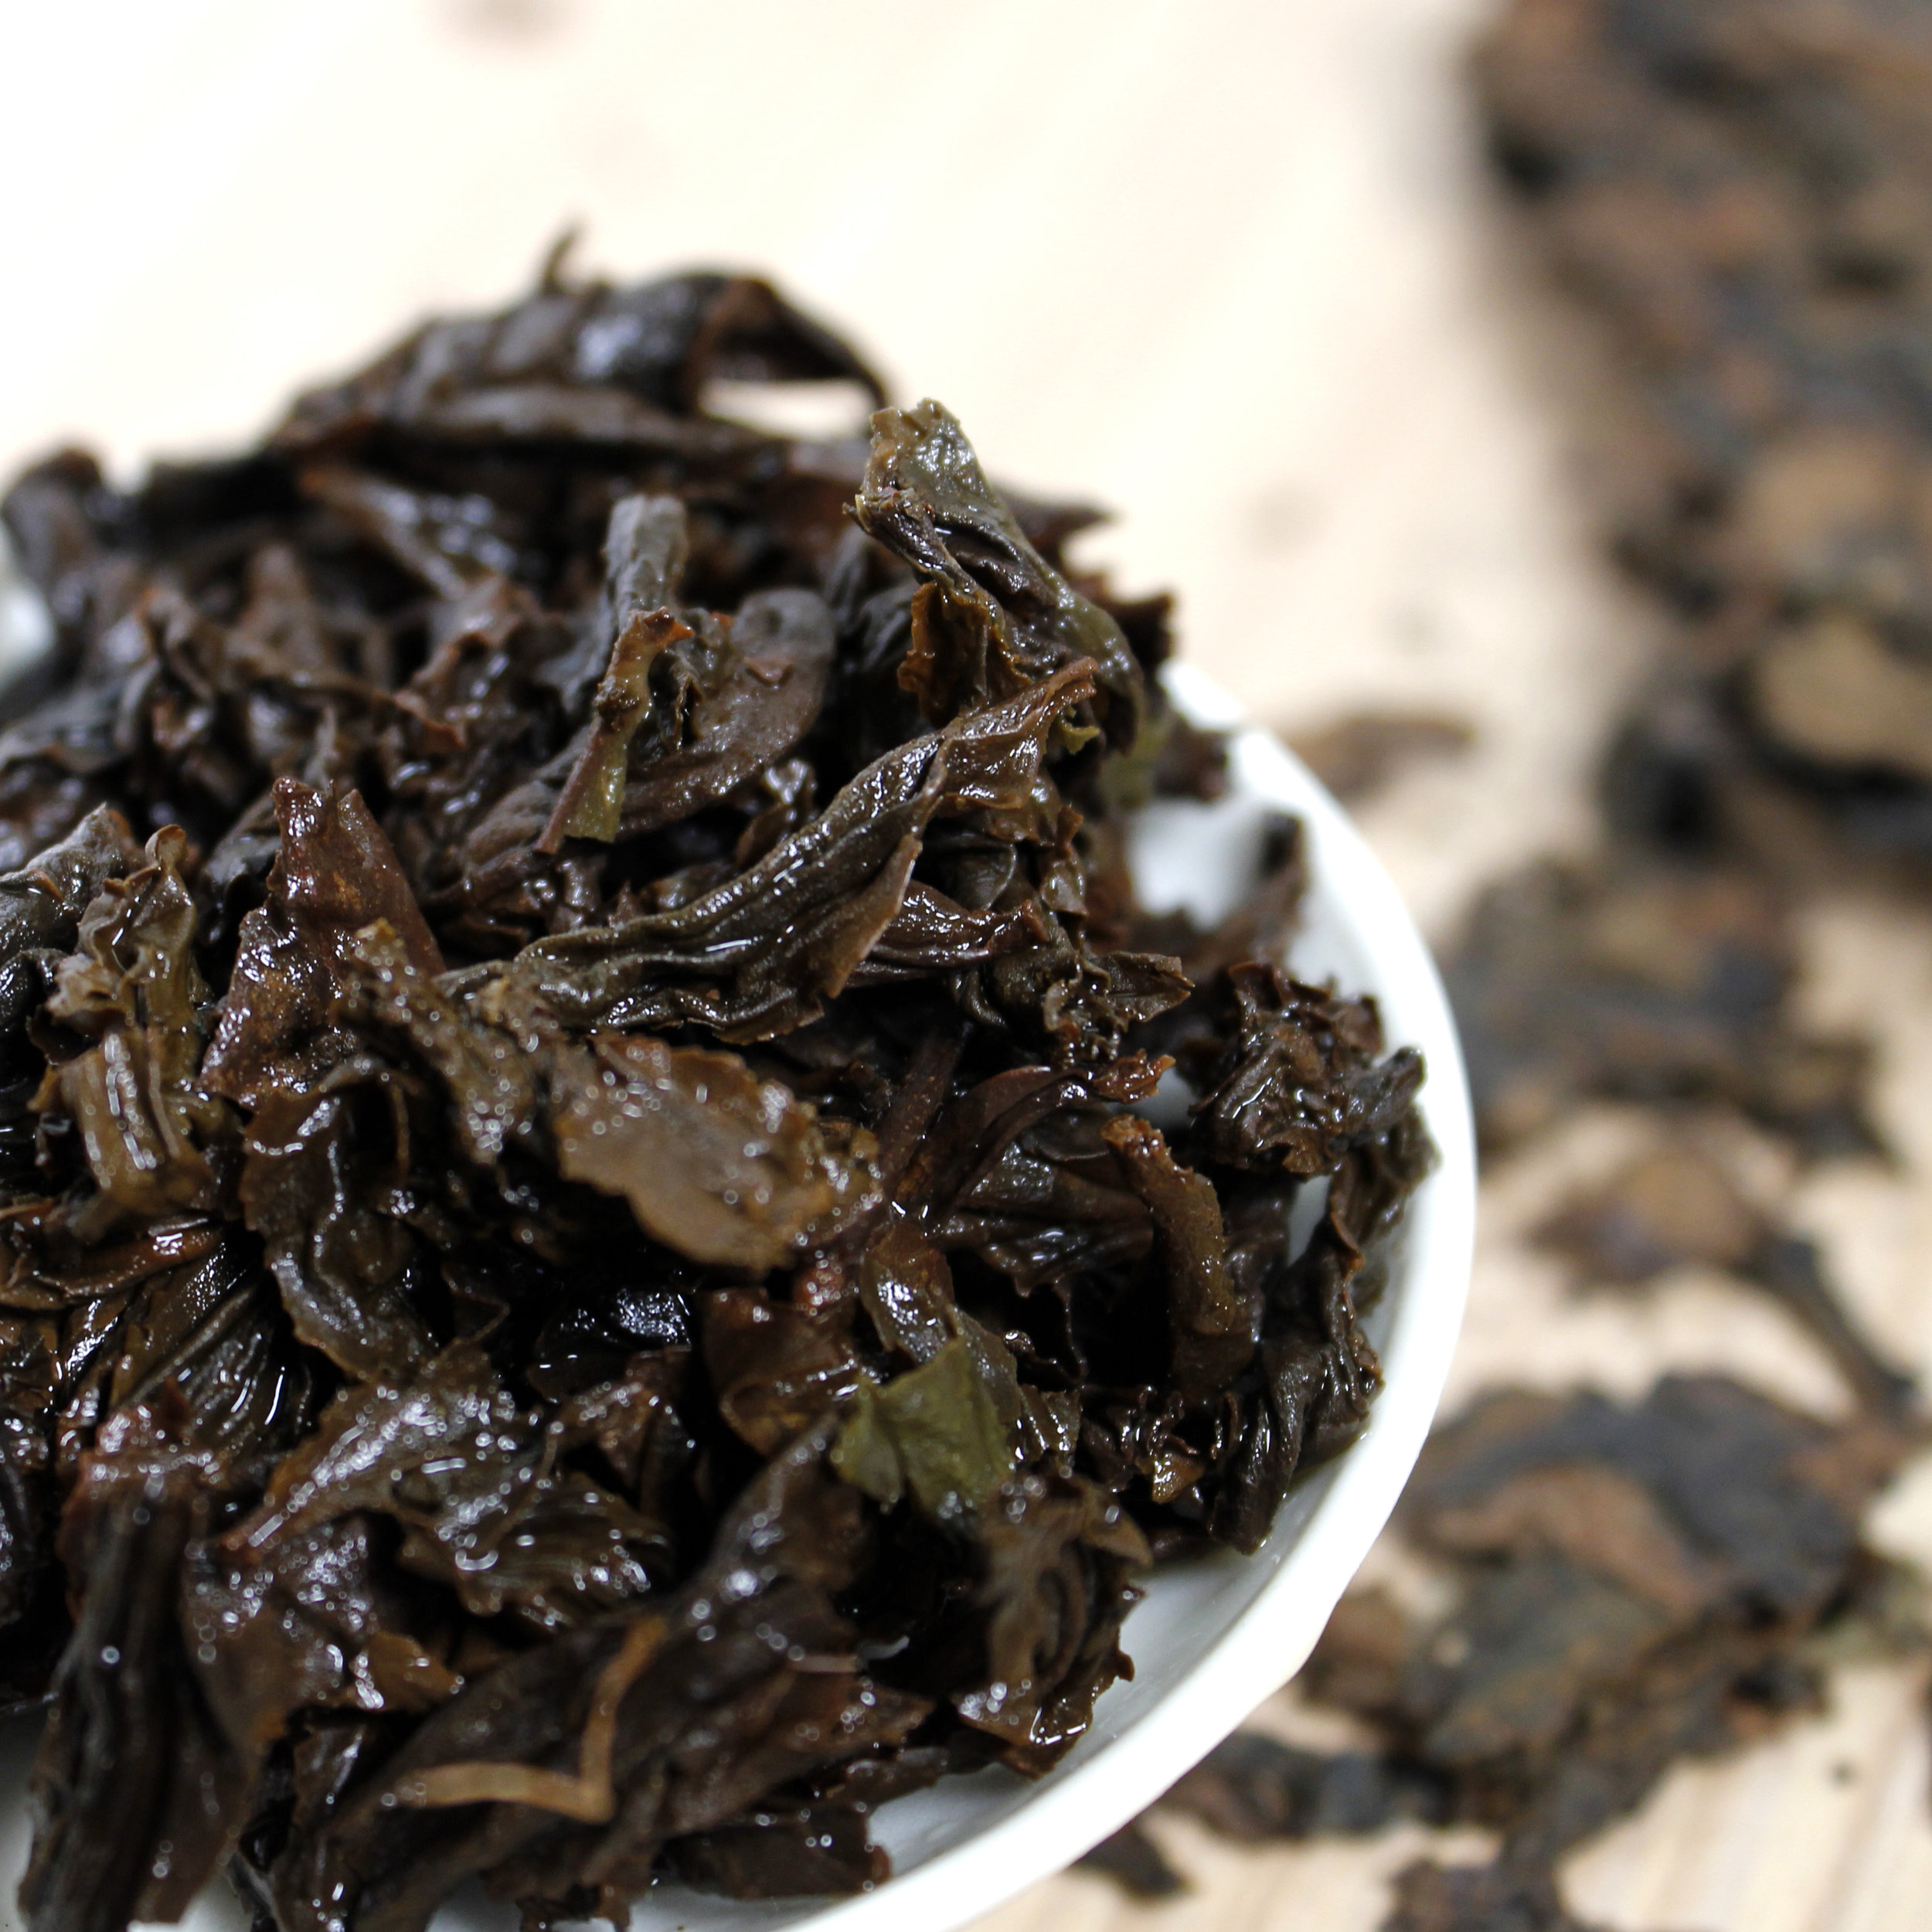 gaba-tea-cake-whole-leaf-tea-oolong-itw3-2019a.jpg